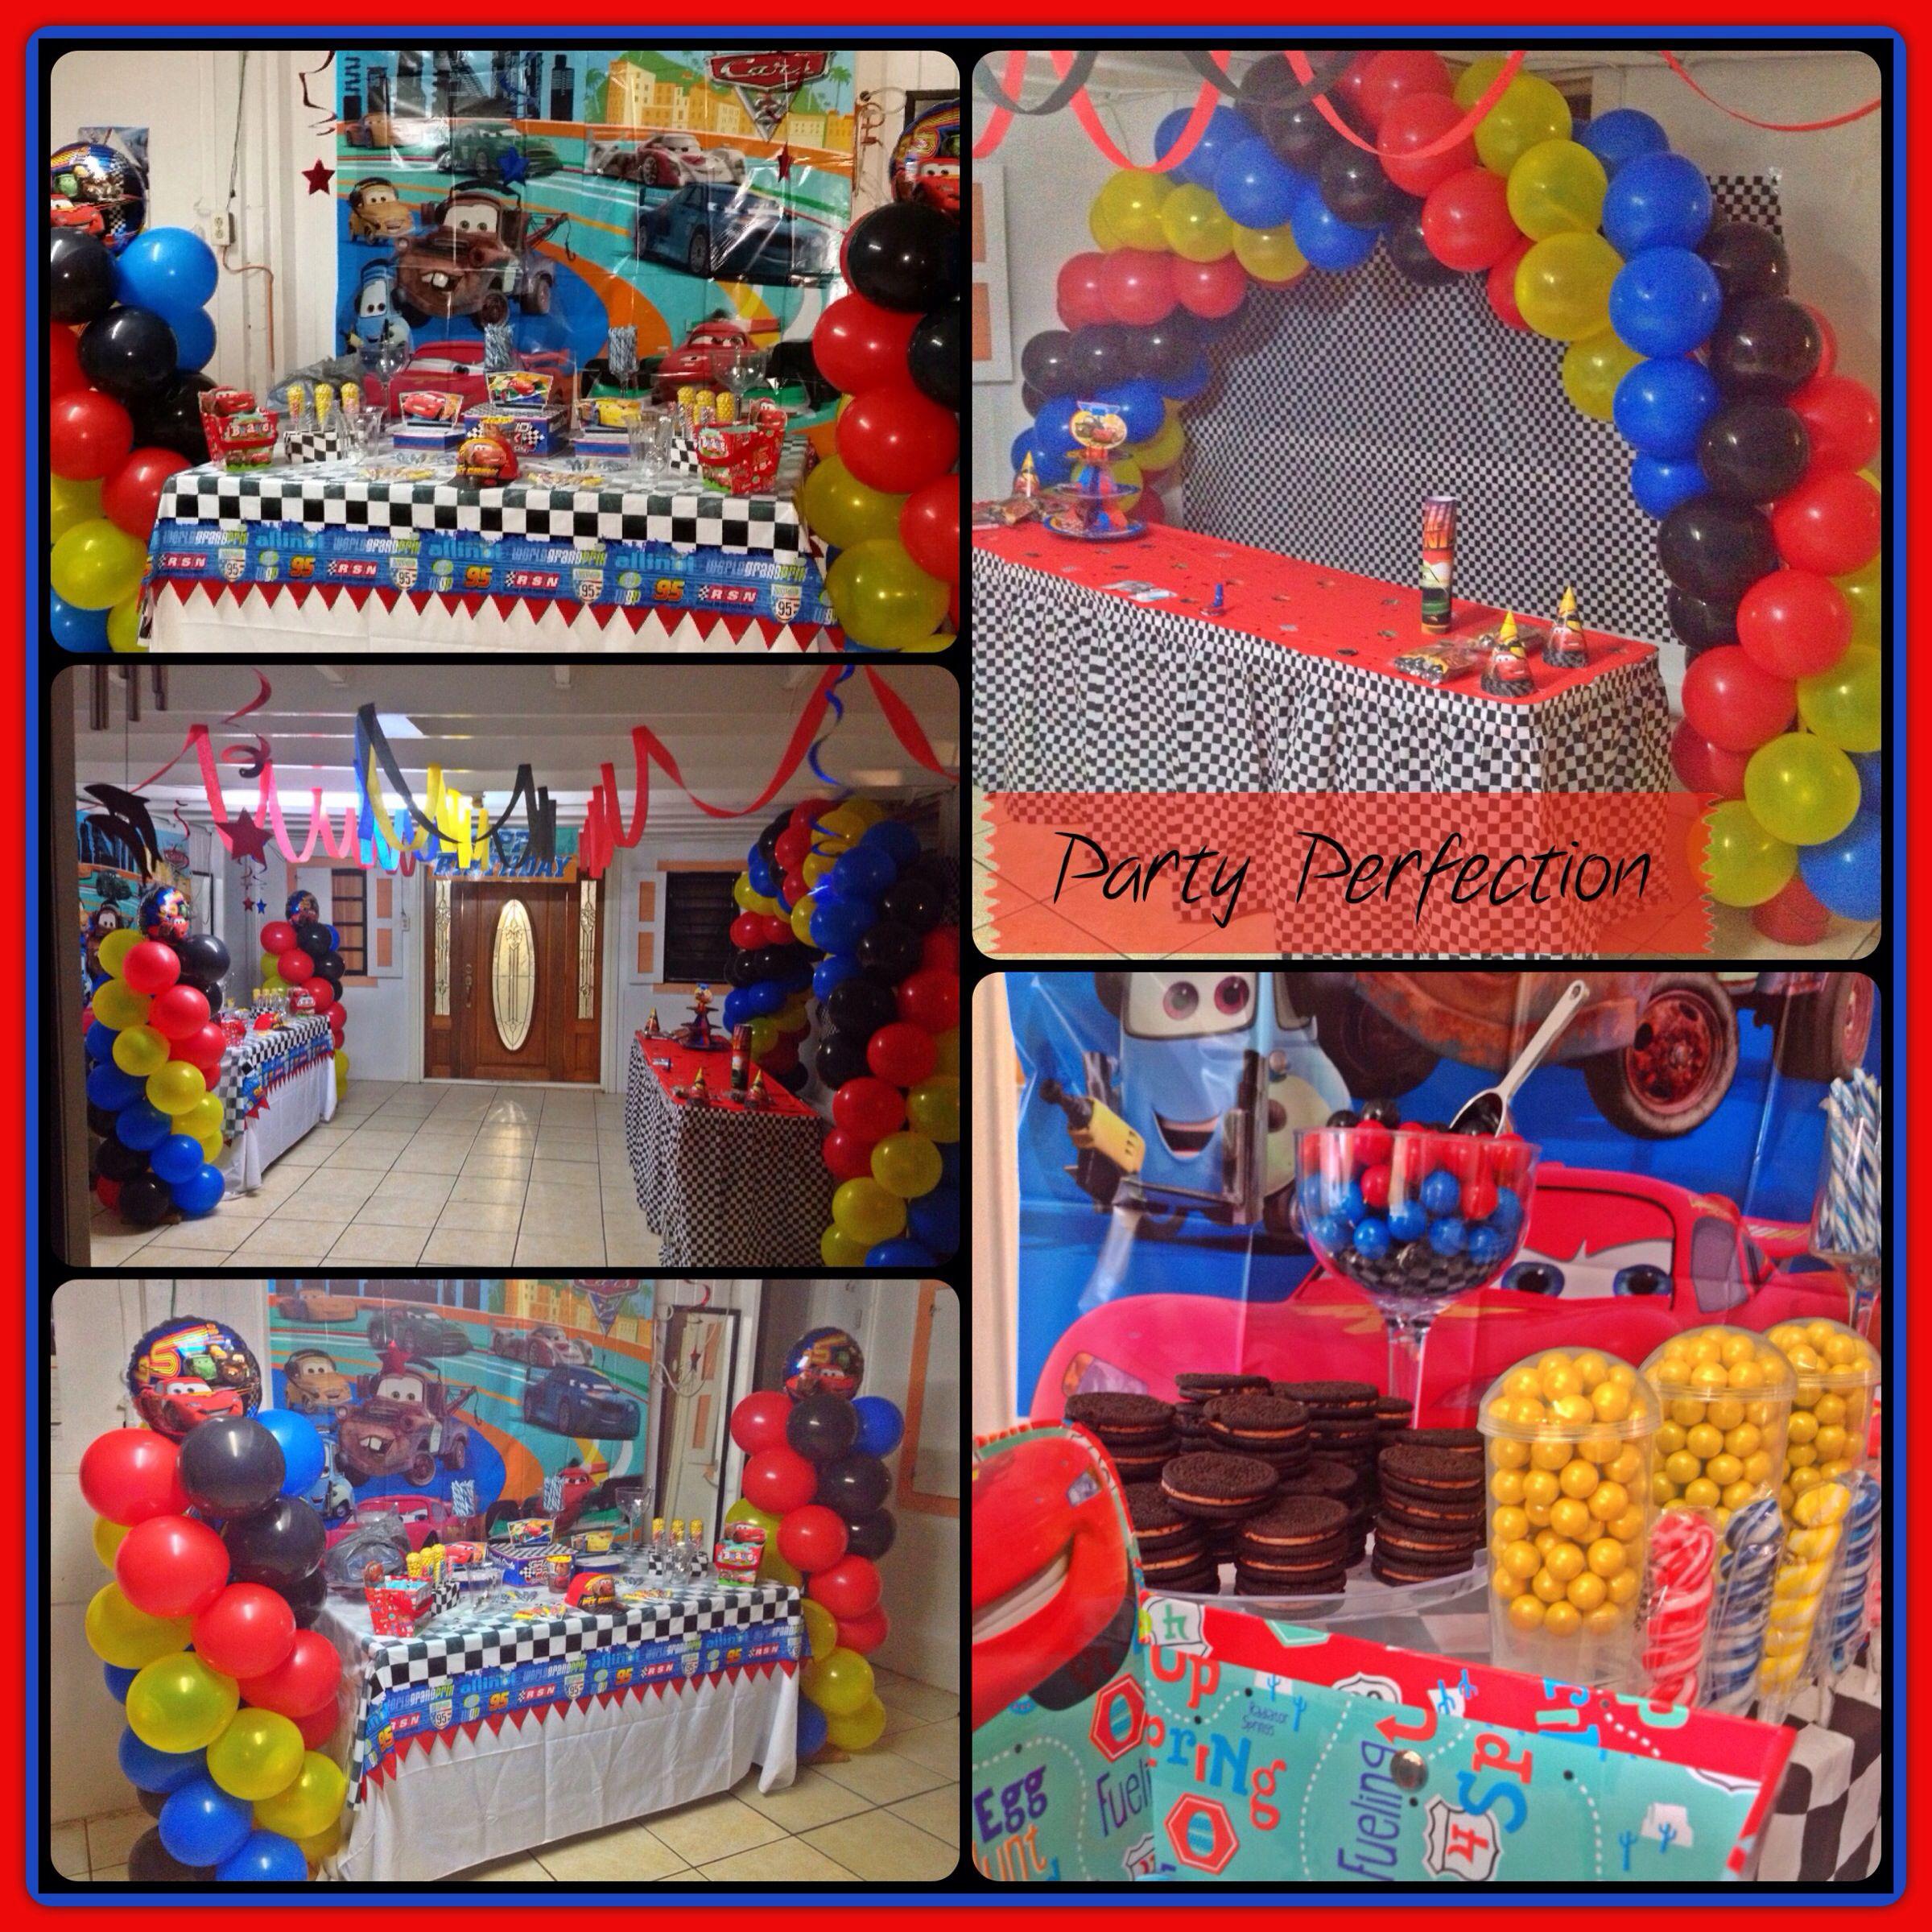 Car decoration toys  Cars Theme Birthday decor by Glenda  Party Decor by Party